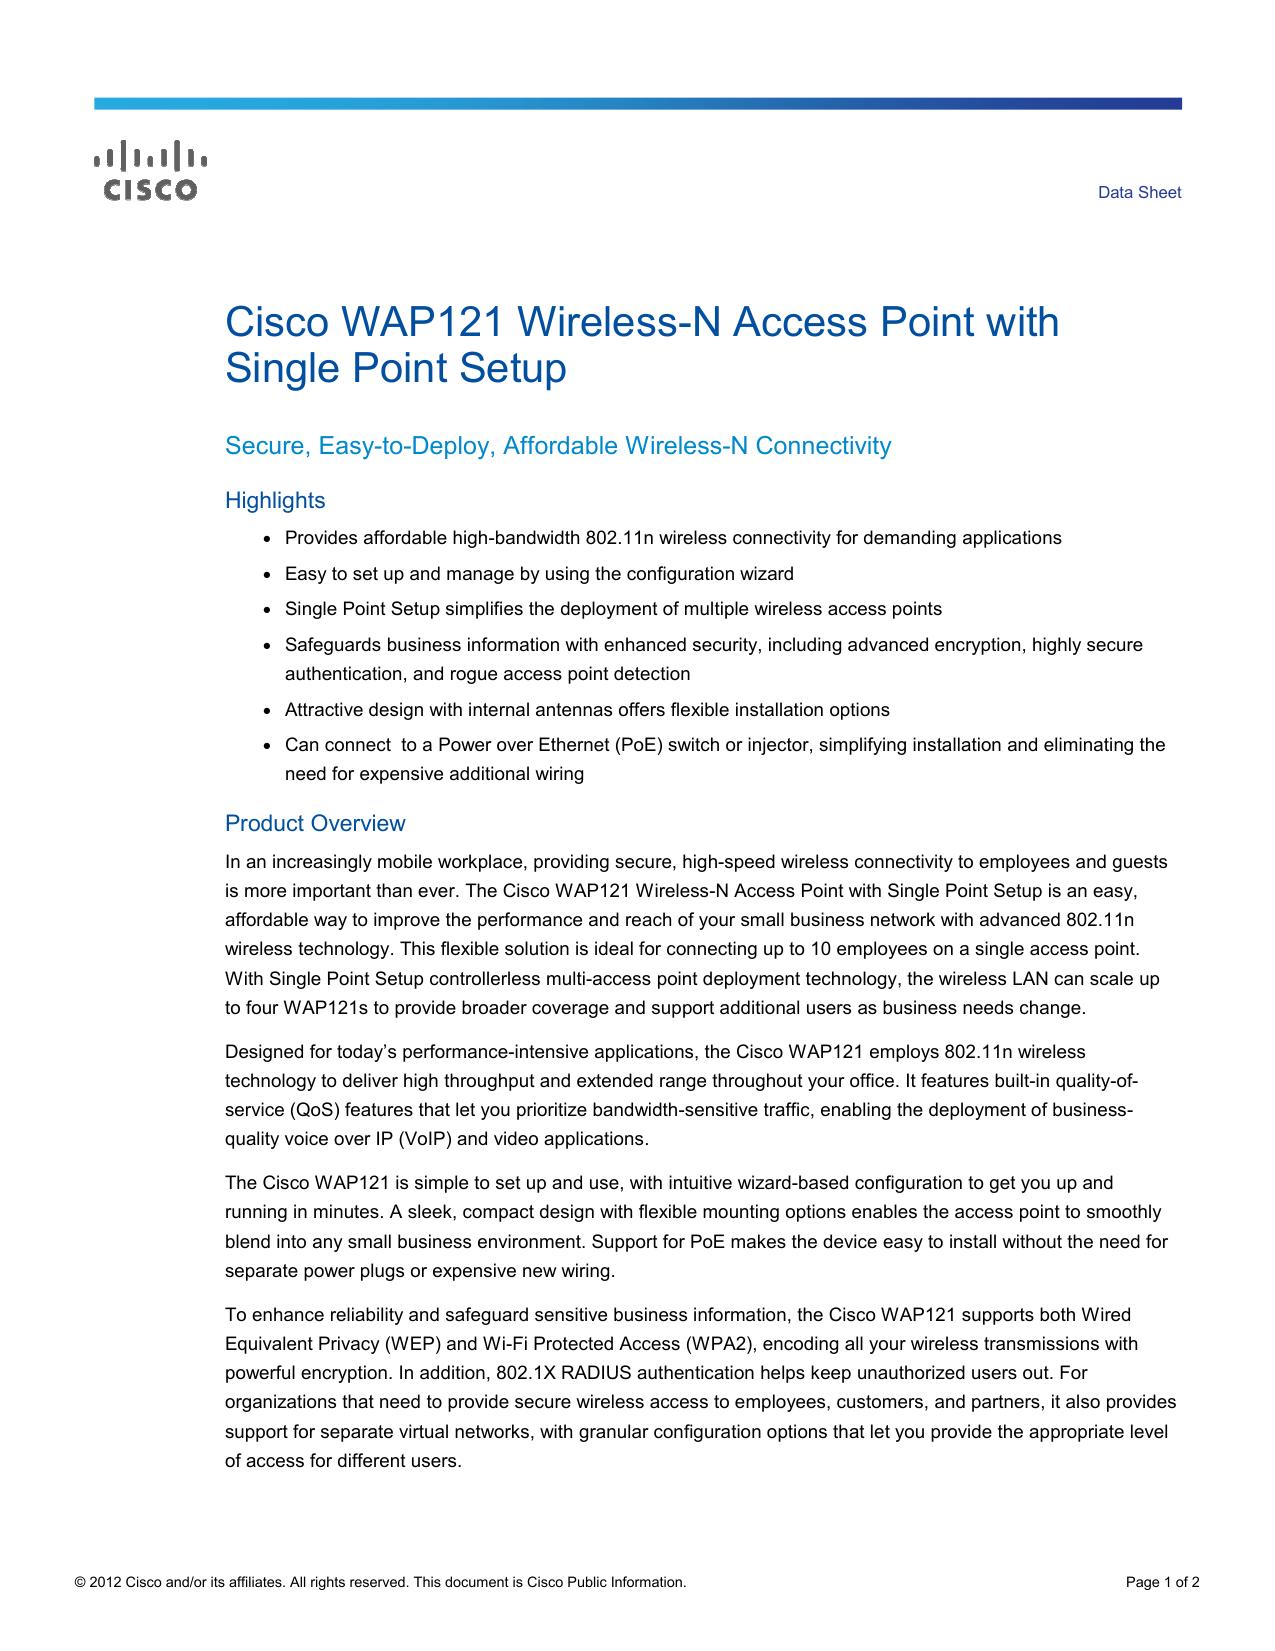 Cisco Wap121 Wireless N Access Point With Single Point Setup Wap121 A K9 Na